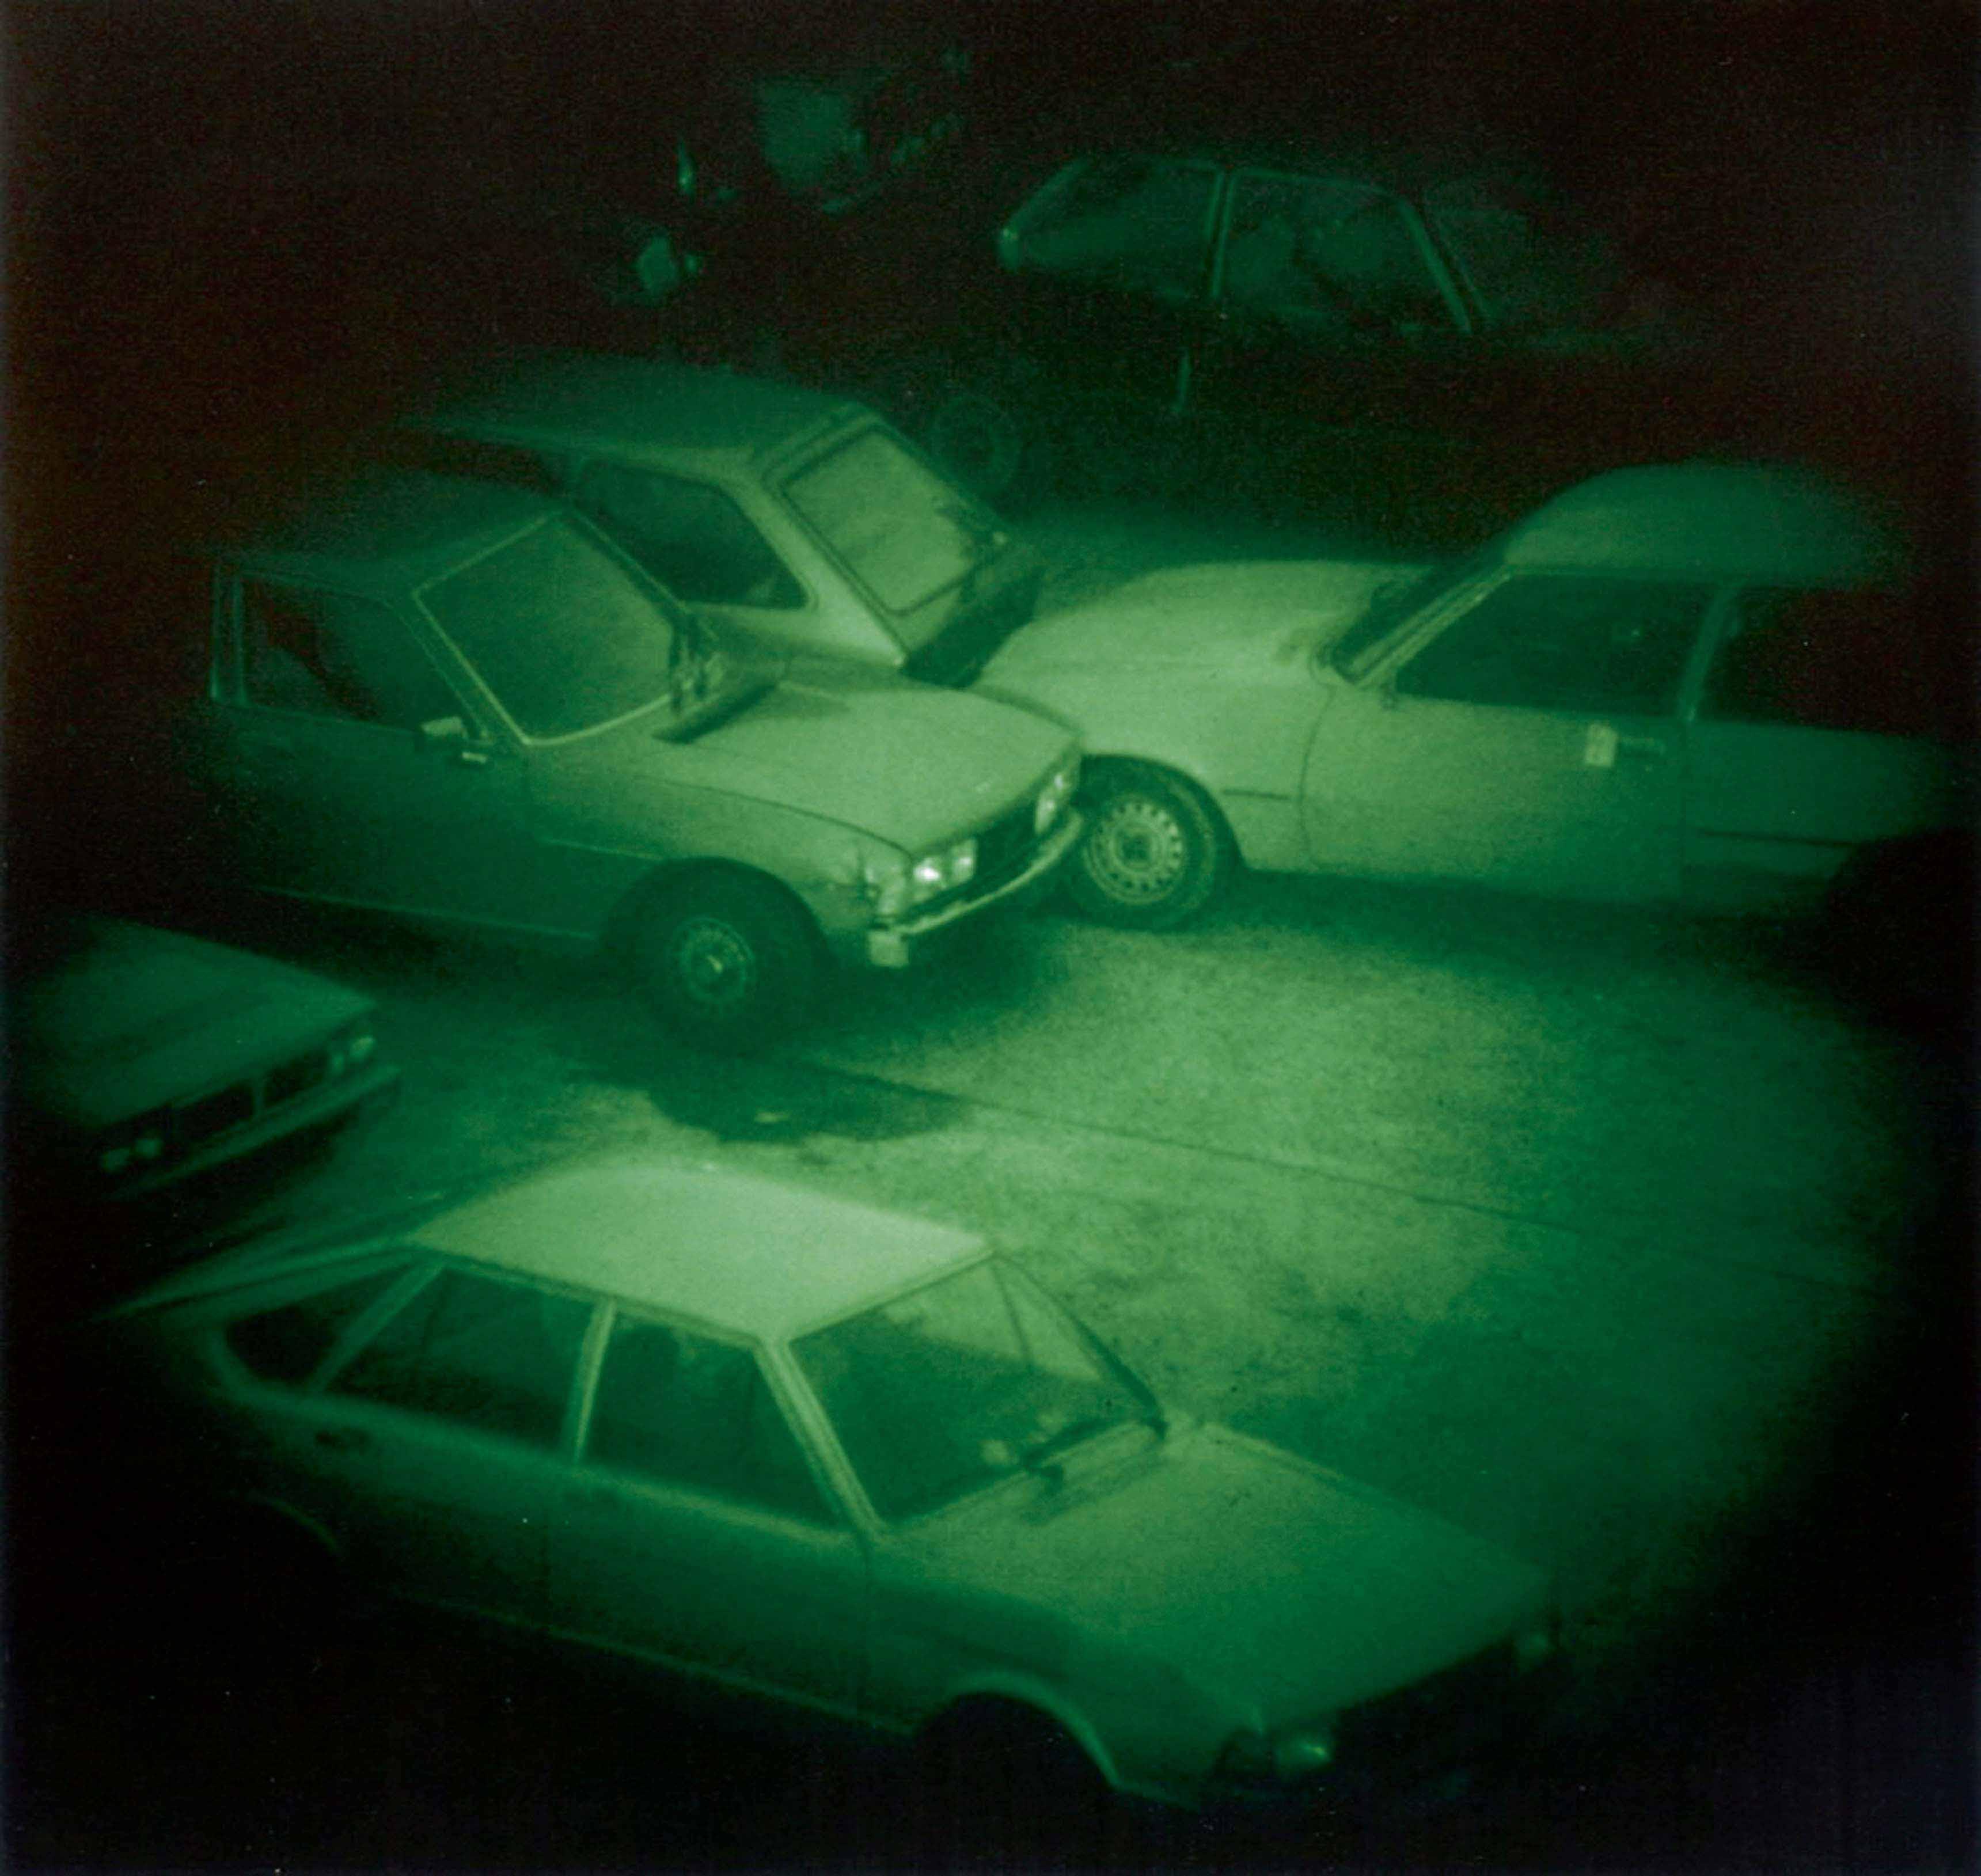 Nacht 9 II (Night 9 II), 1992 © Thomas Ruff. Image courtesy Whitechapel Gallery,